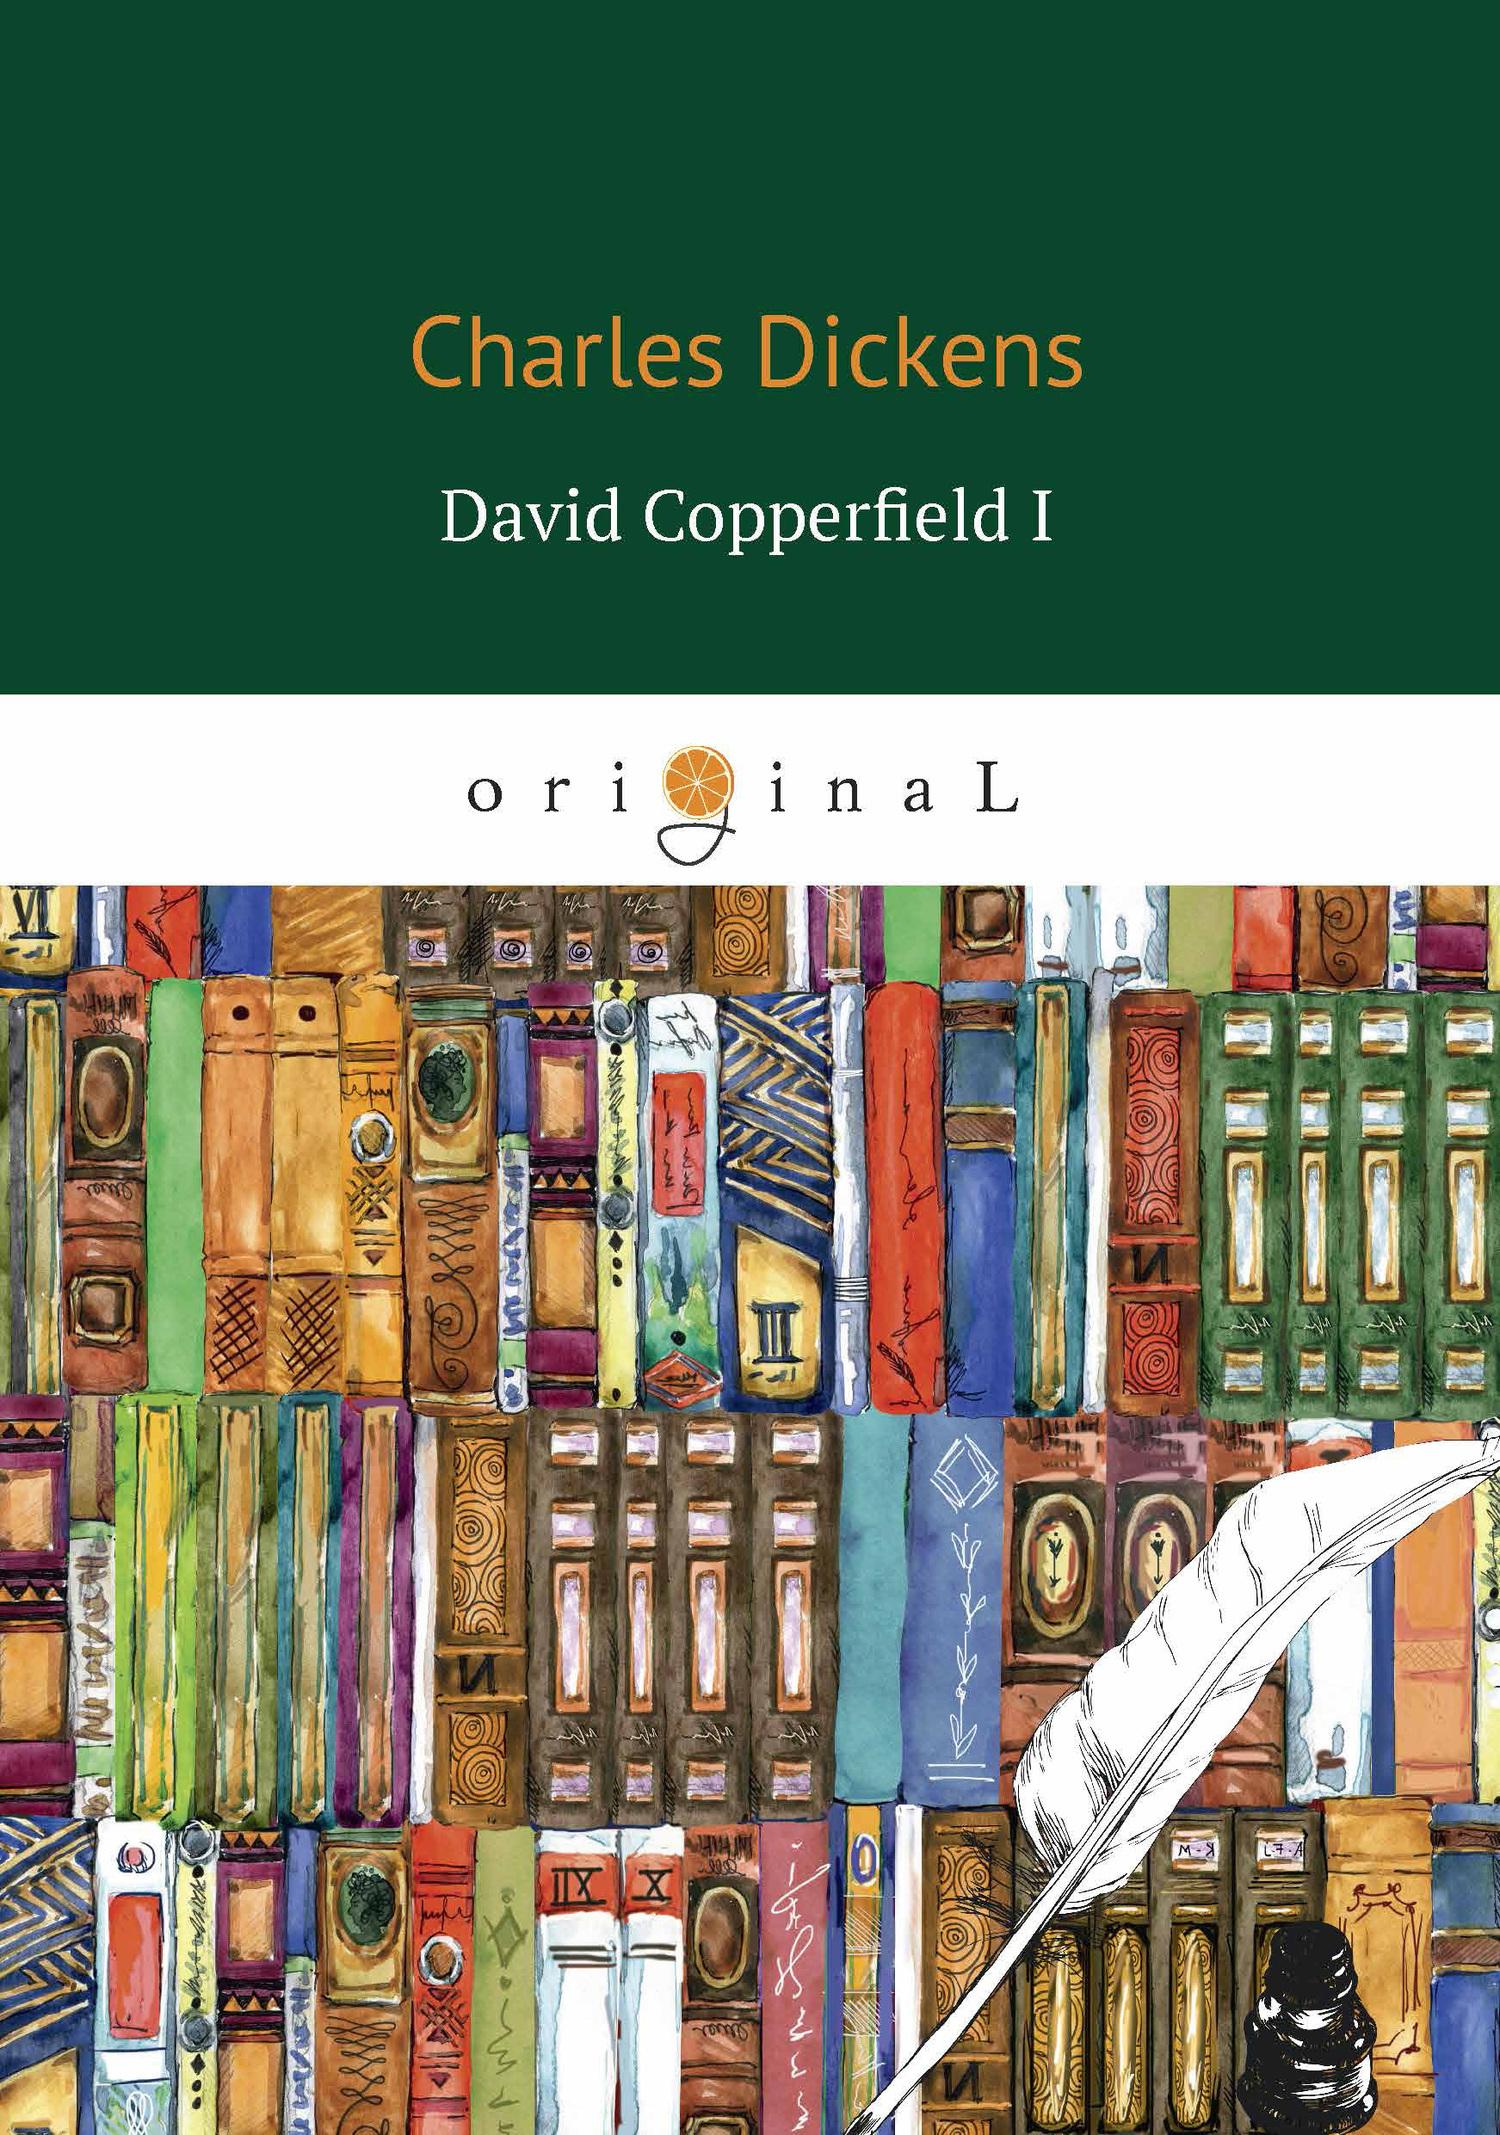 Чарльз Диккенс David Copperfield I impact of stress determinants on job satisfaction among nursing staff